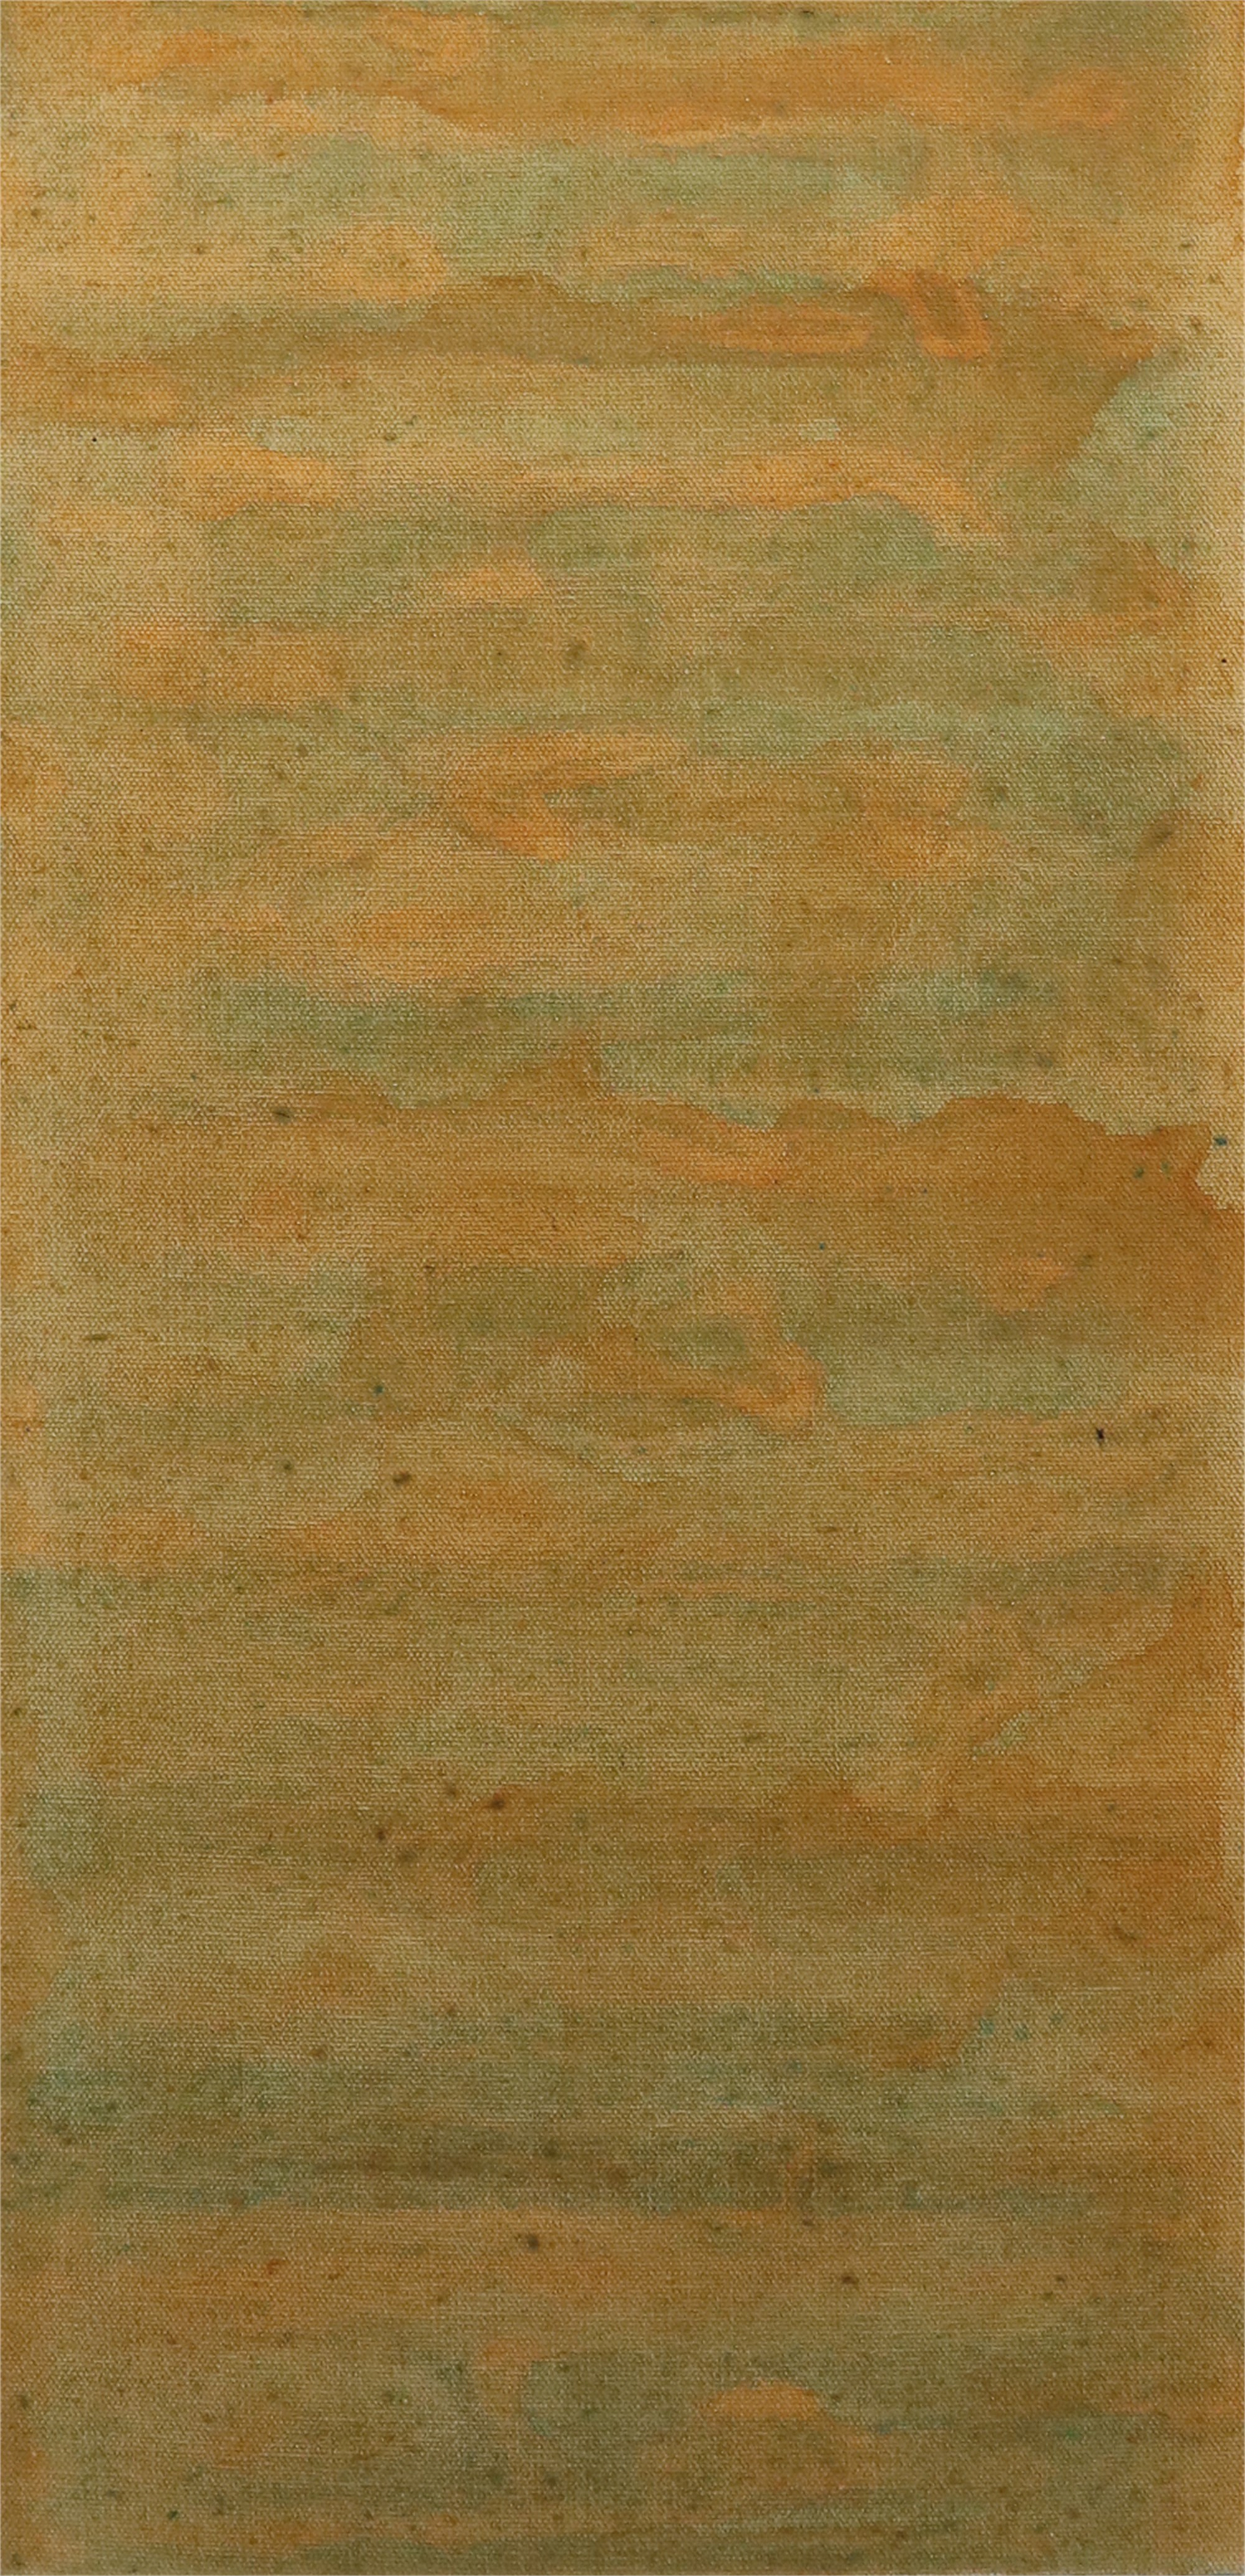 Codex IV by Steven Anton Rehage